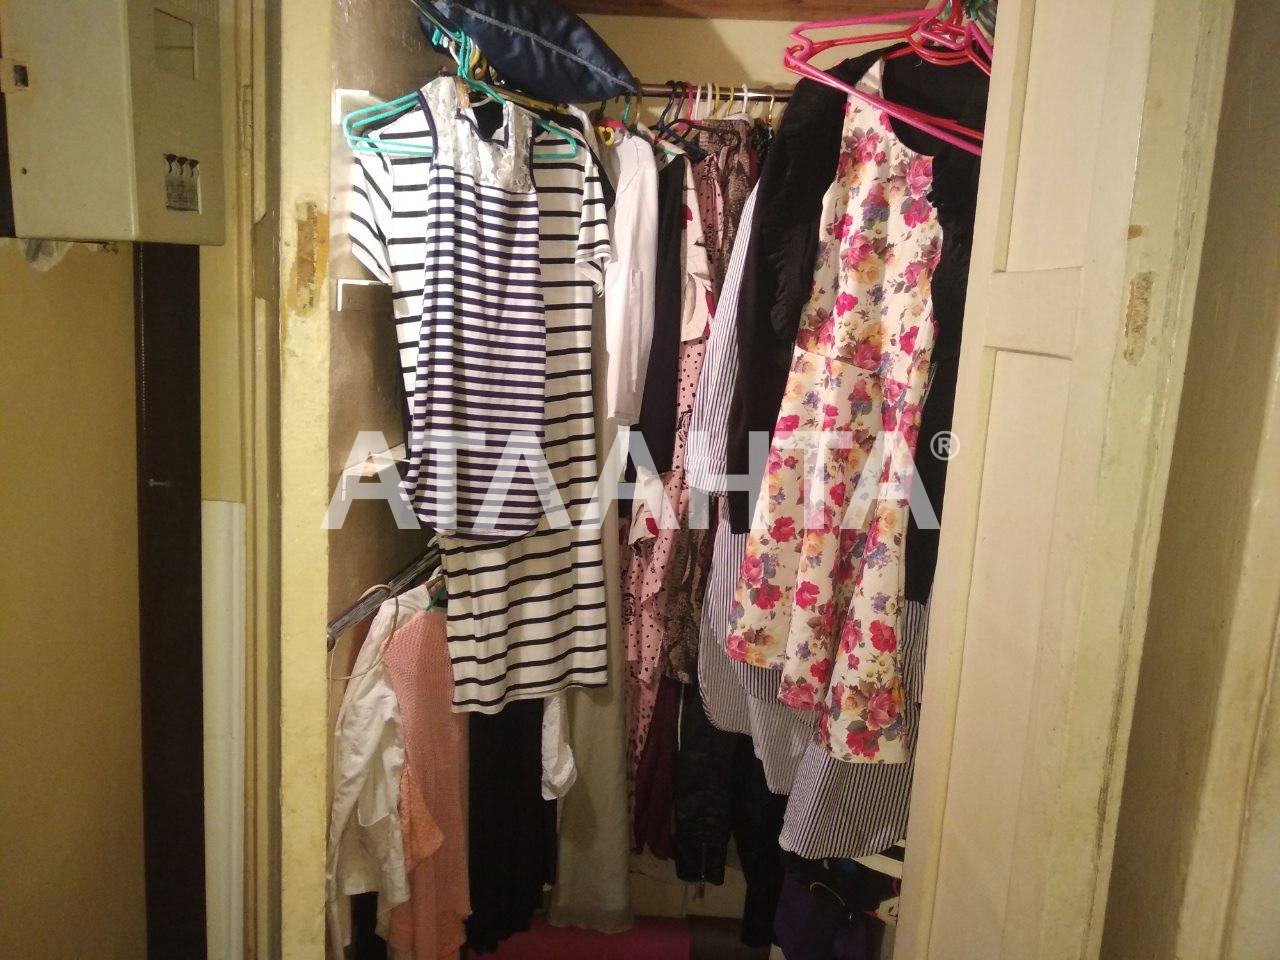 Продается 4-комнатная Квартира на ул. Малиновского Марш. — 43 000 у.е. (фото №13)